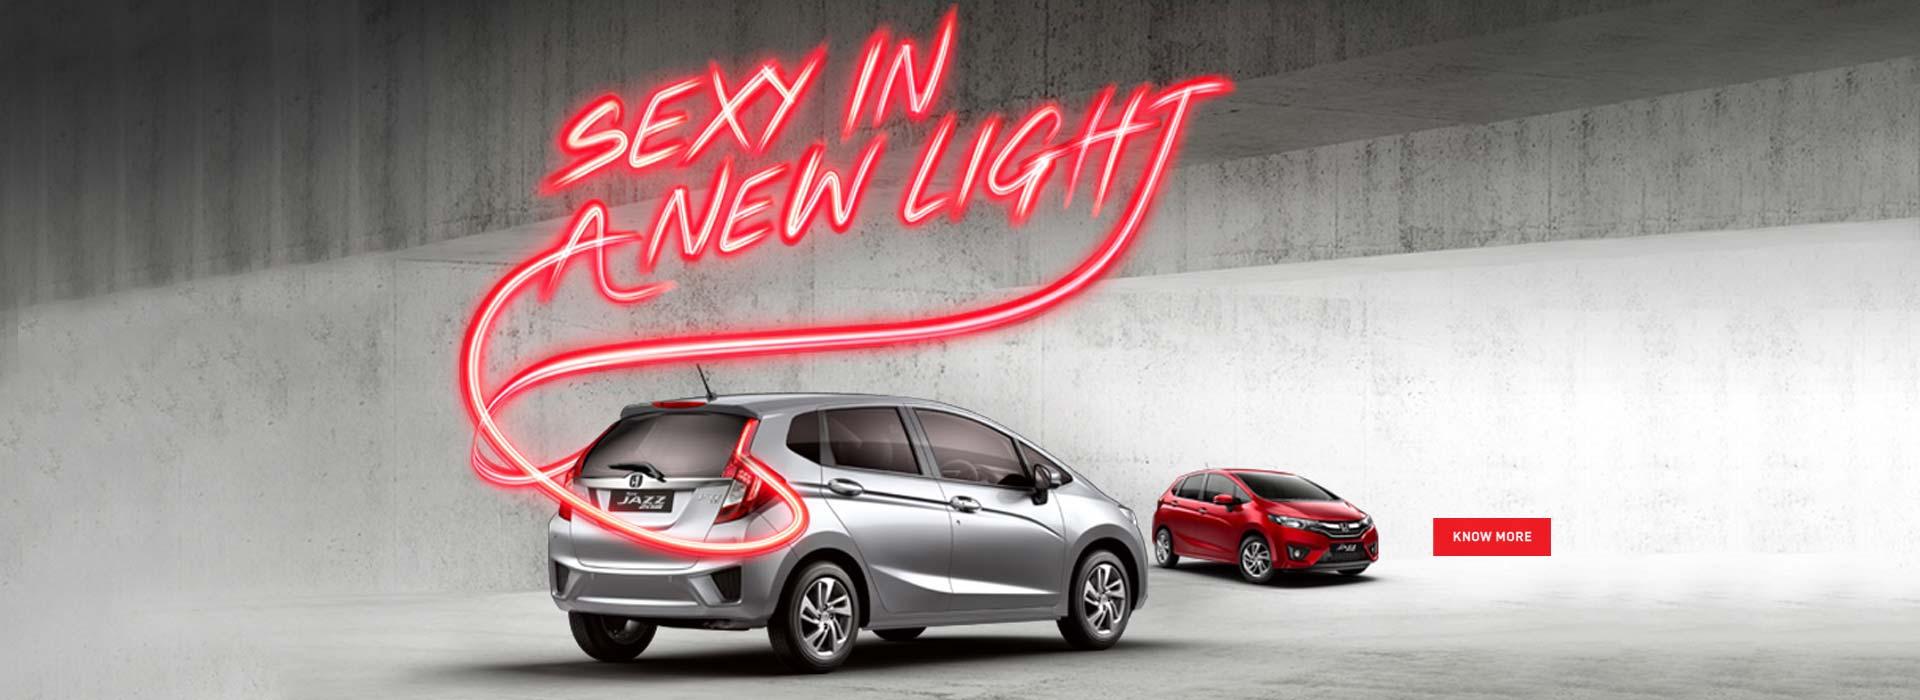 Capital Honda Tamilnadu Authorized New Car Dealer